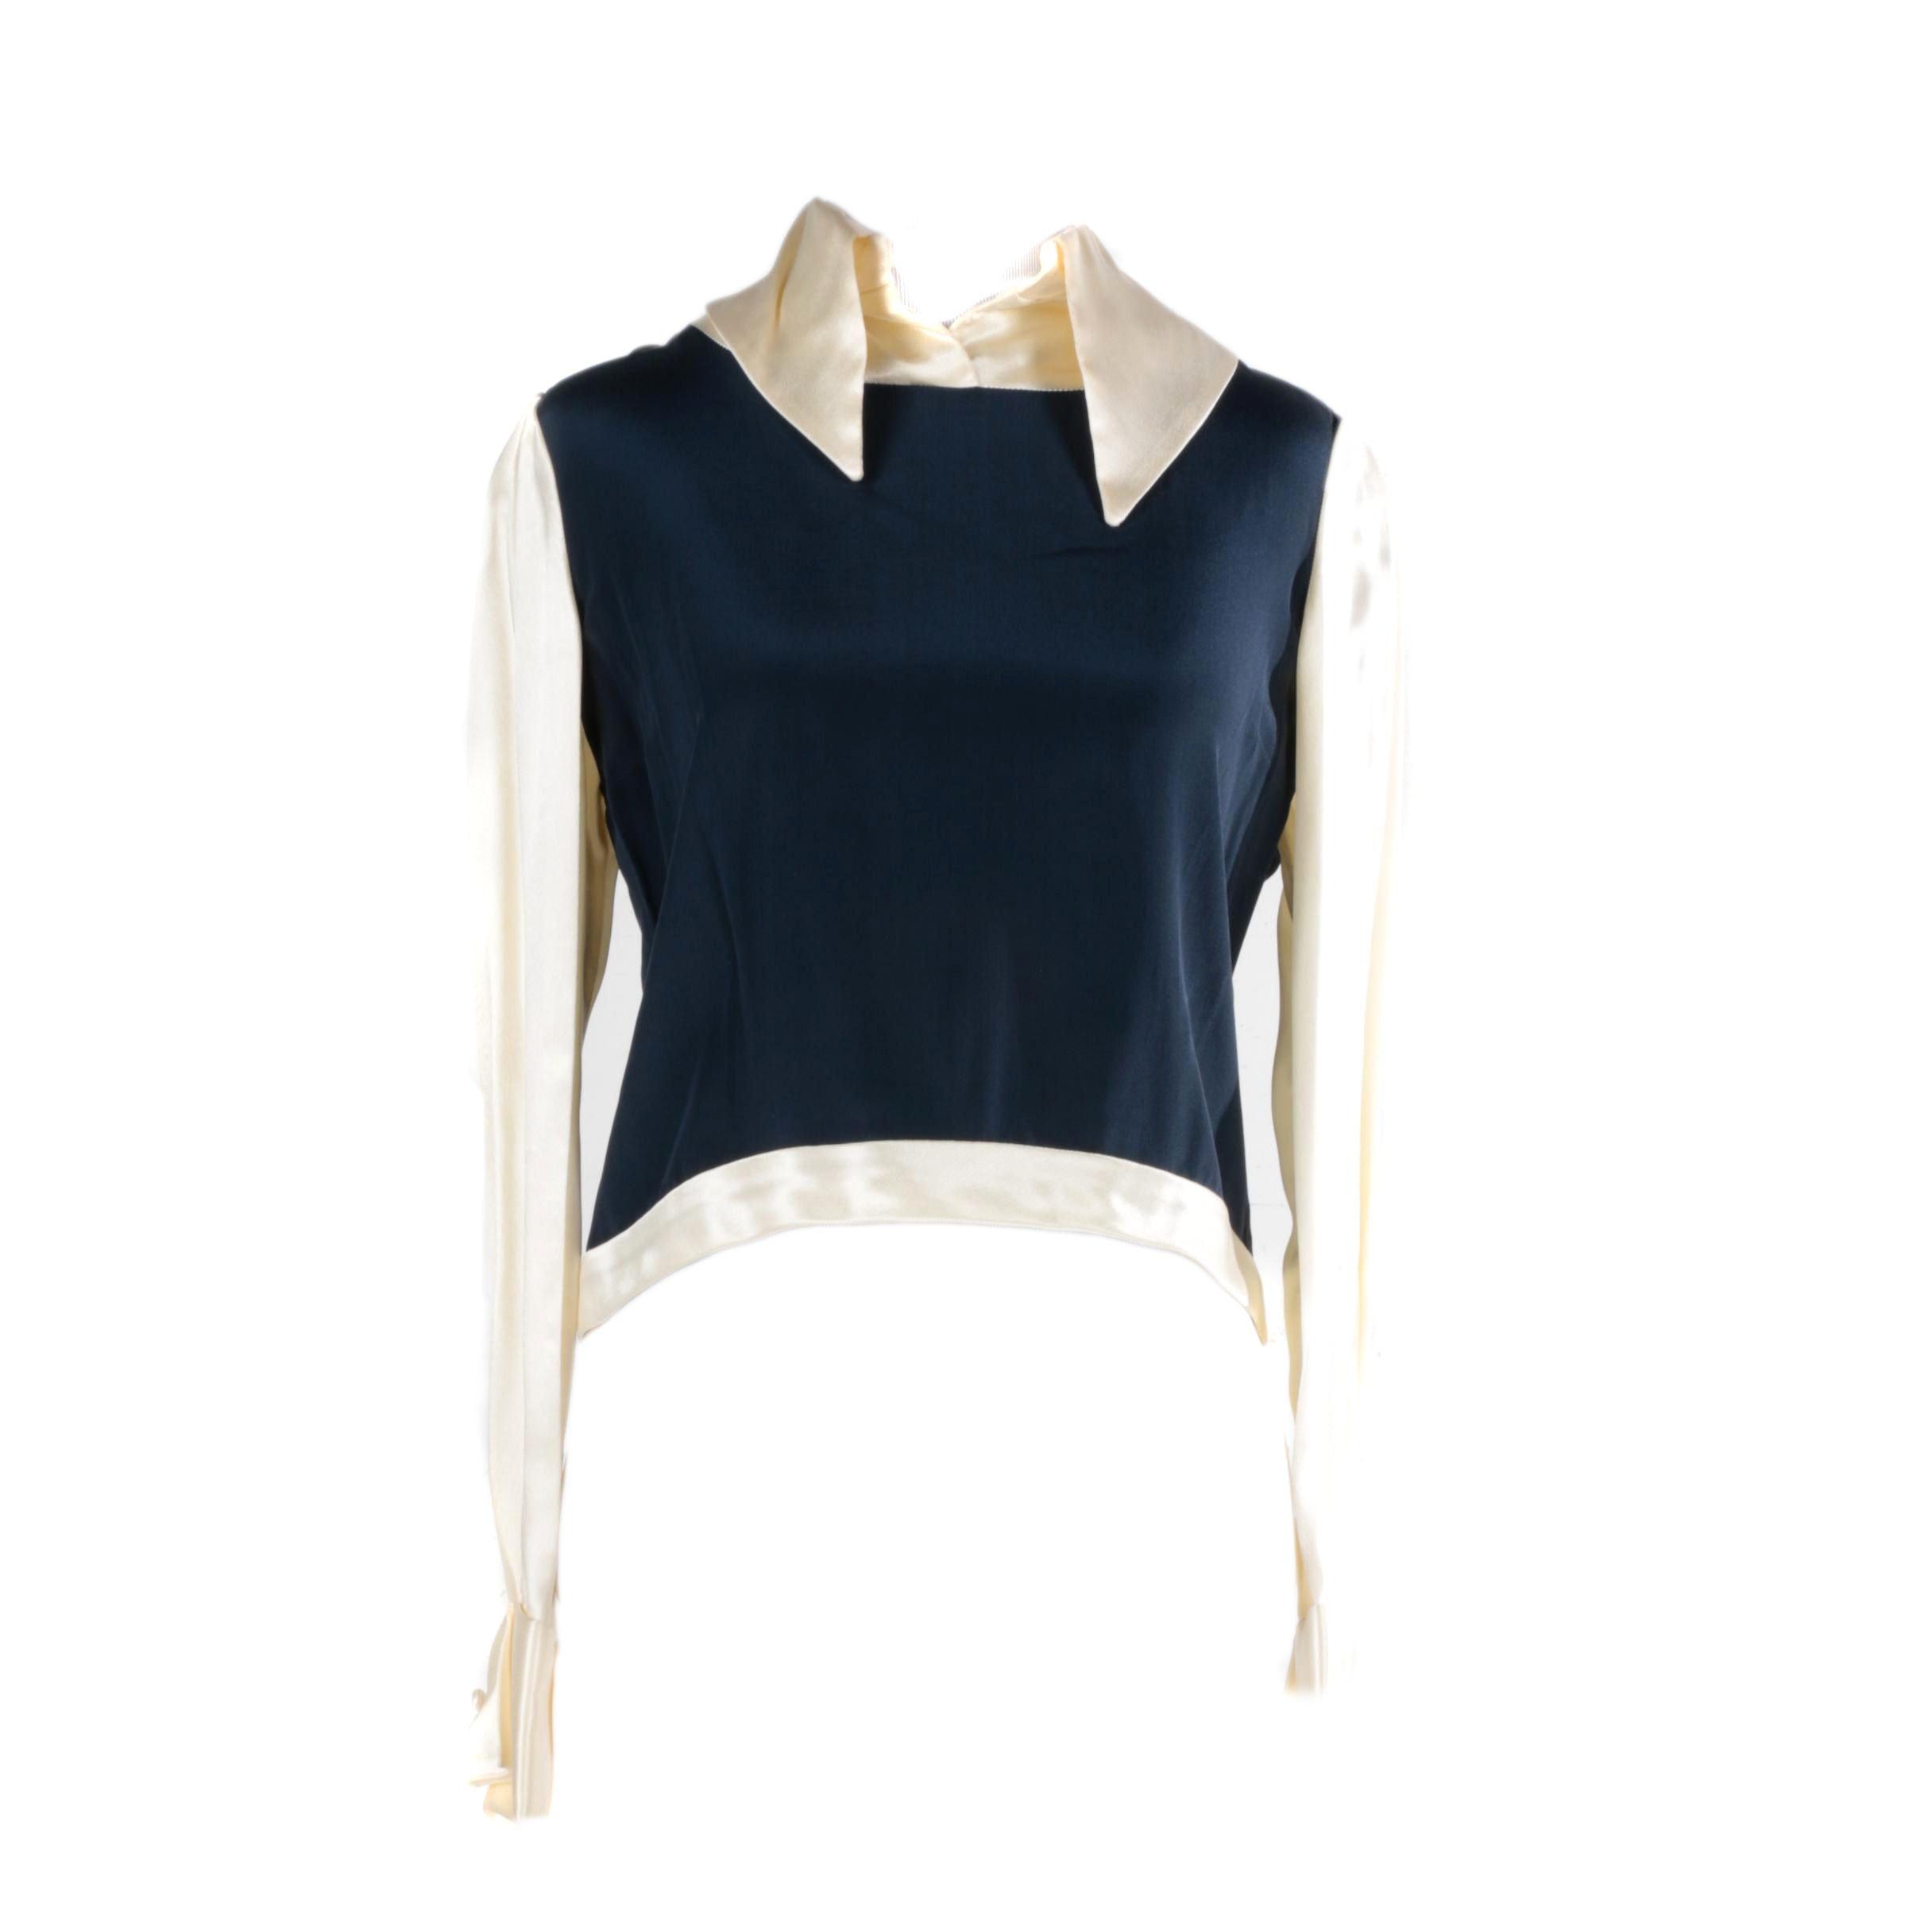 Women's Vintage Circa 1970s Cardinali Cream and Blue Dress Shirt